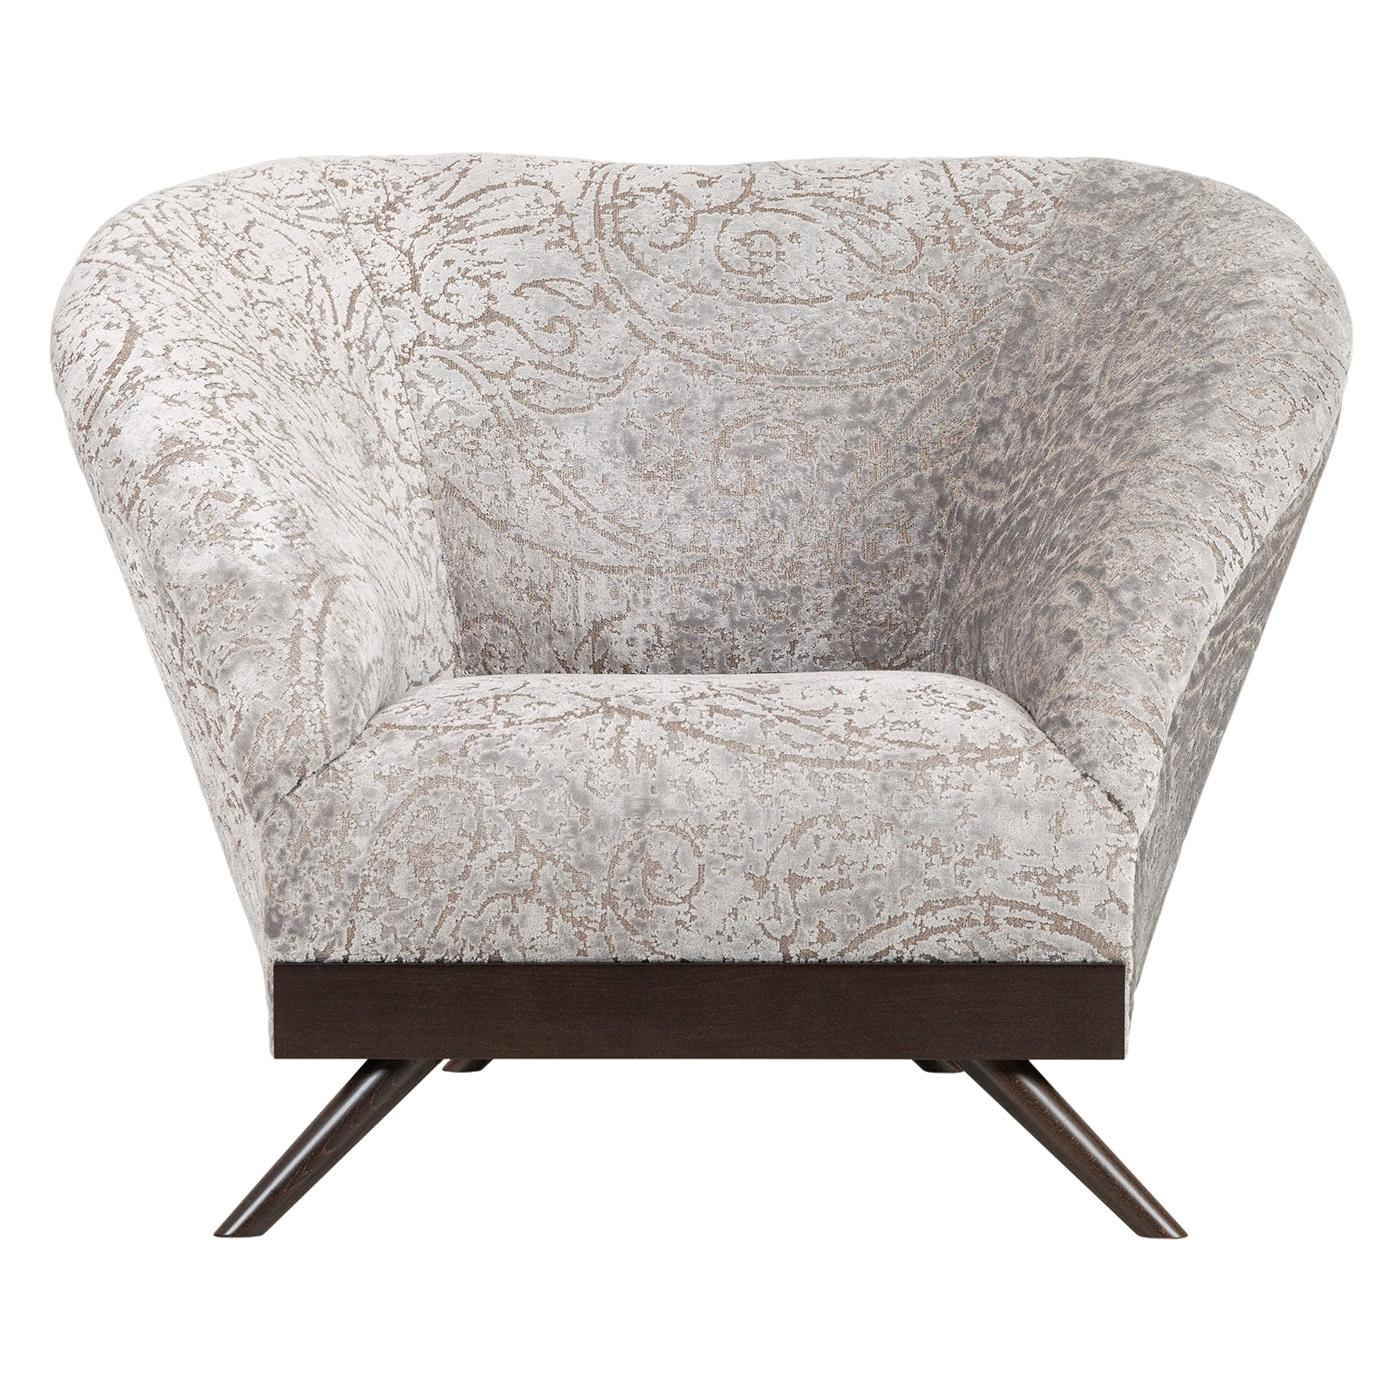 Cambridge Single Seat Sofa Beech Dark Brown Stain Pearl Jacquard Velvet